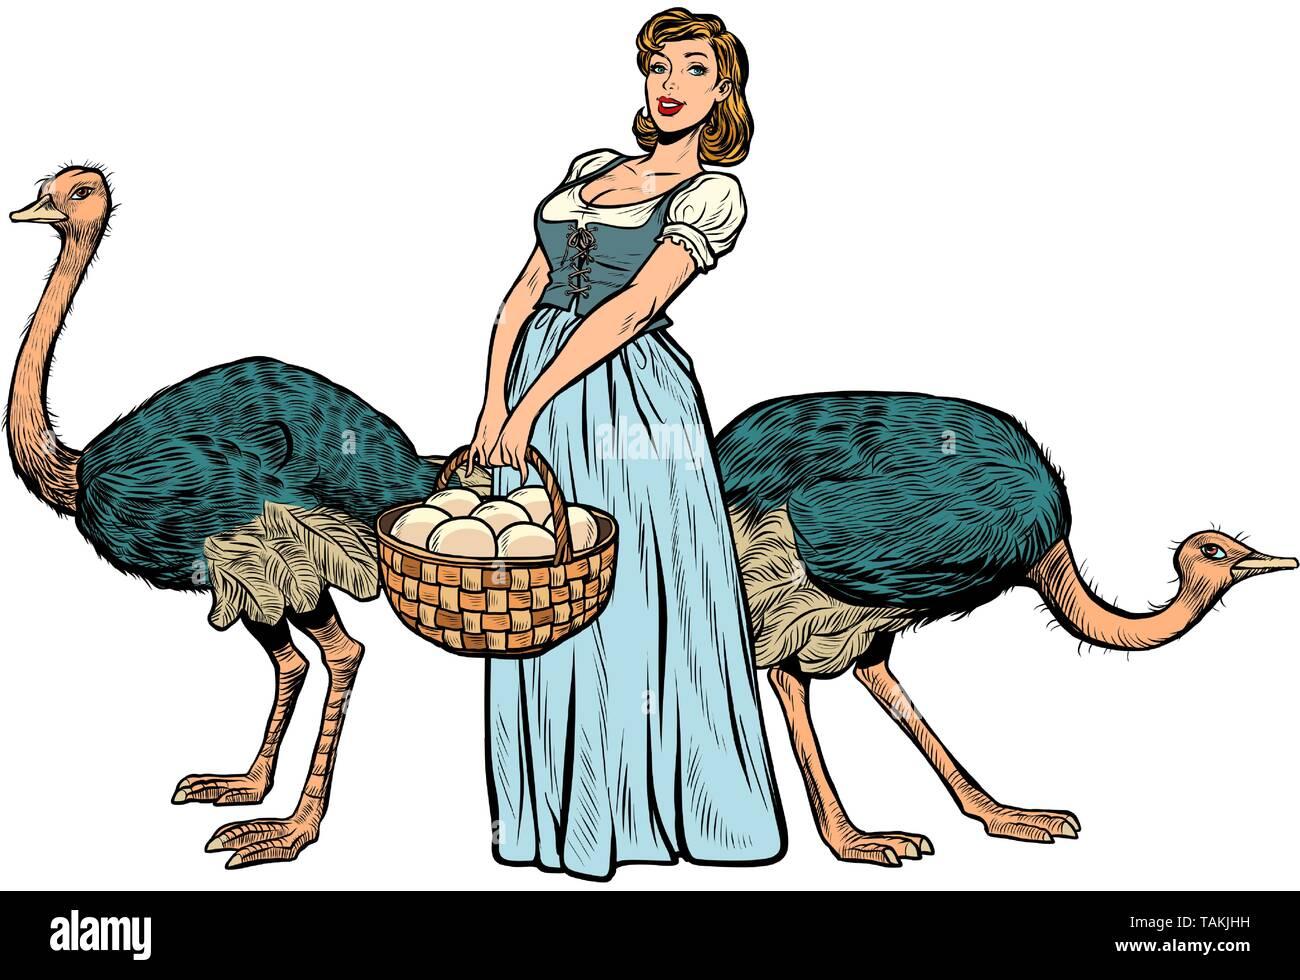 ostrich farm eggs. woman peasant farmer. Pop art retro vector illustration vintage kitsch - Stock Image